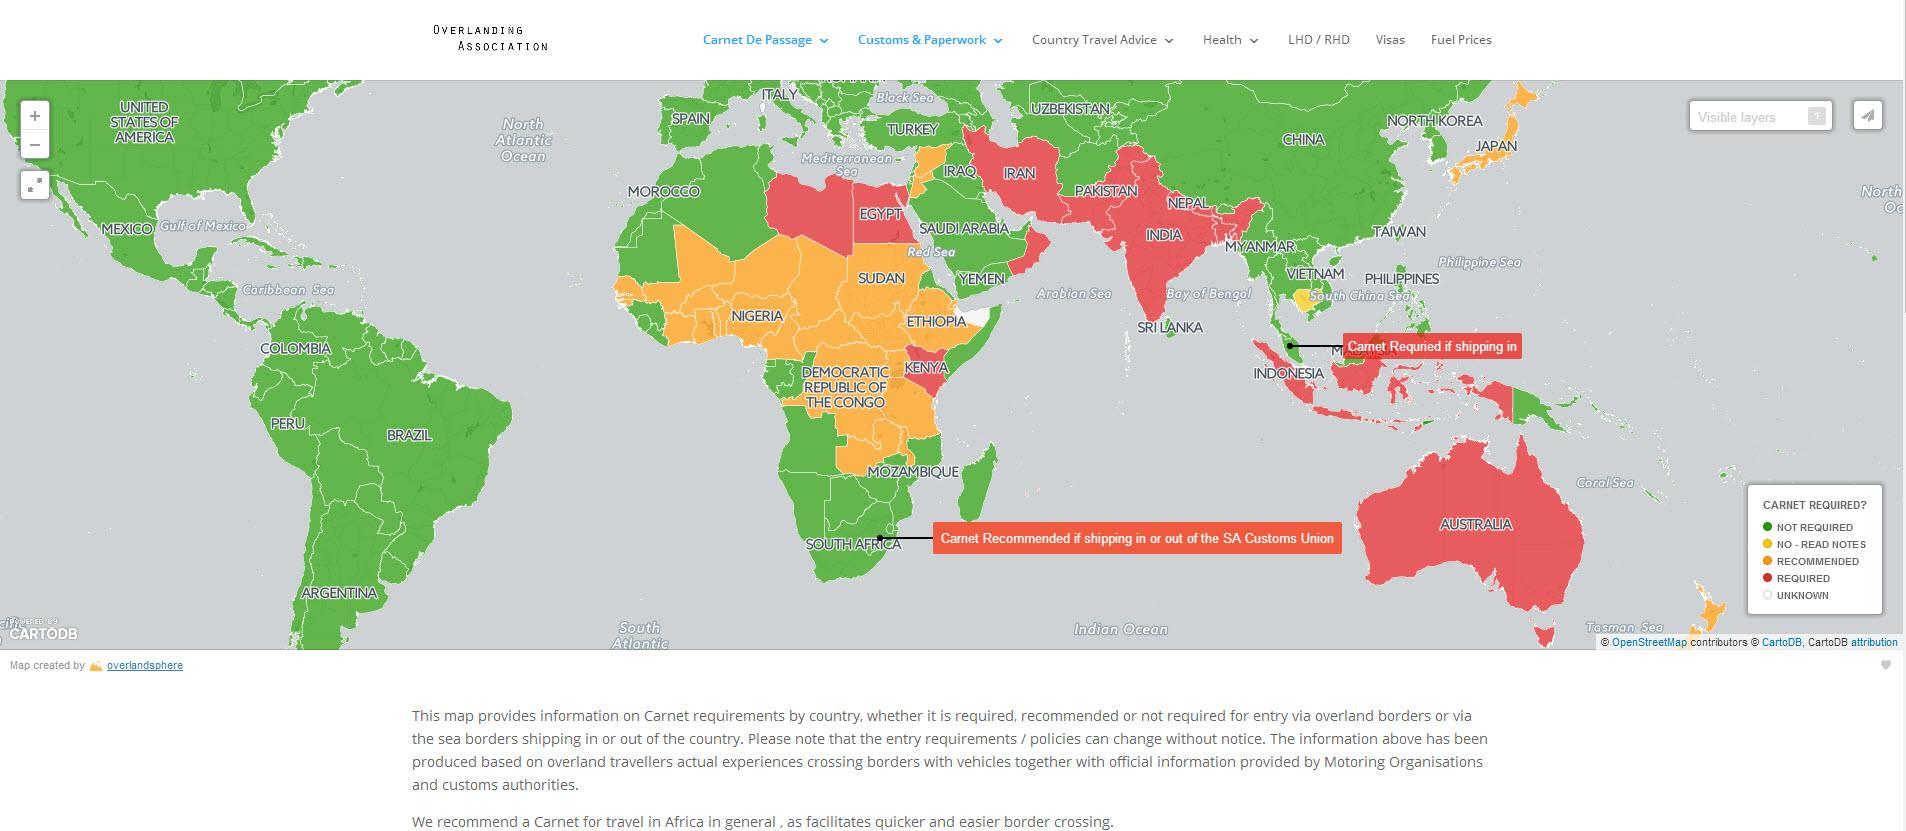 Carnet De Passage Information by Country - Overlanding Association